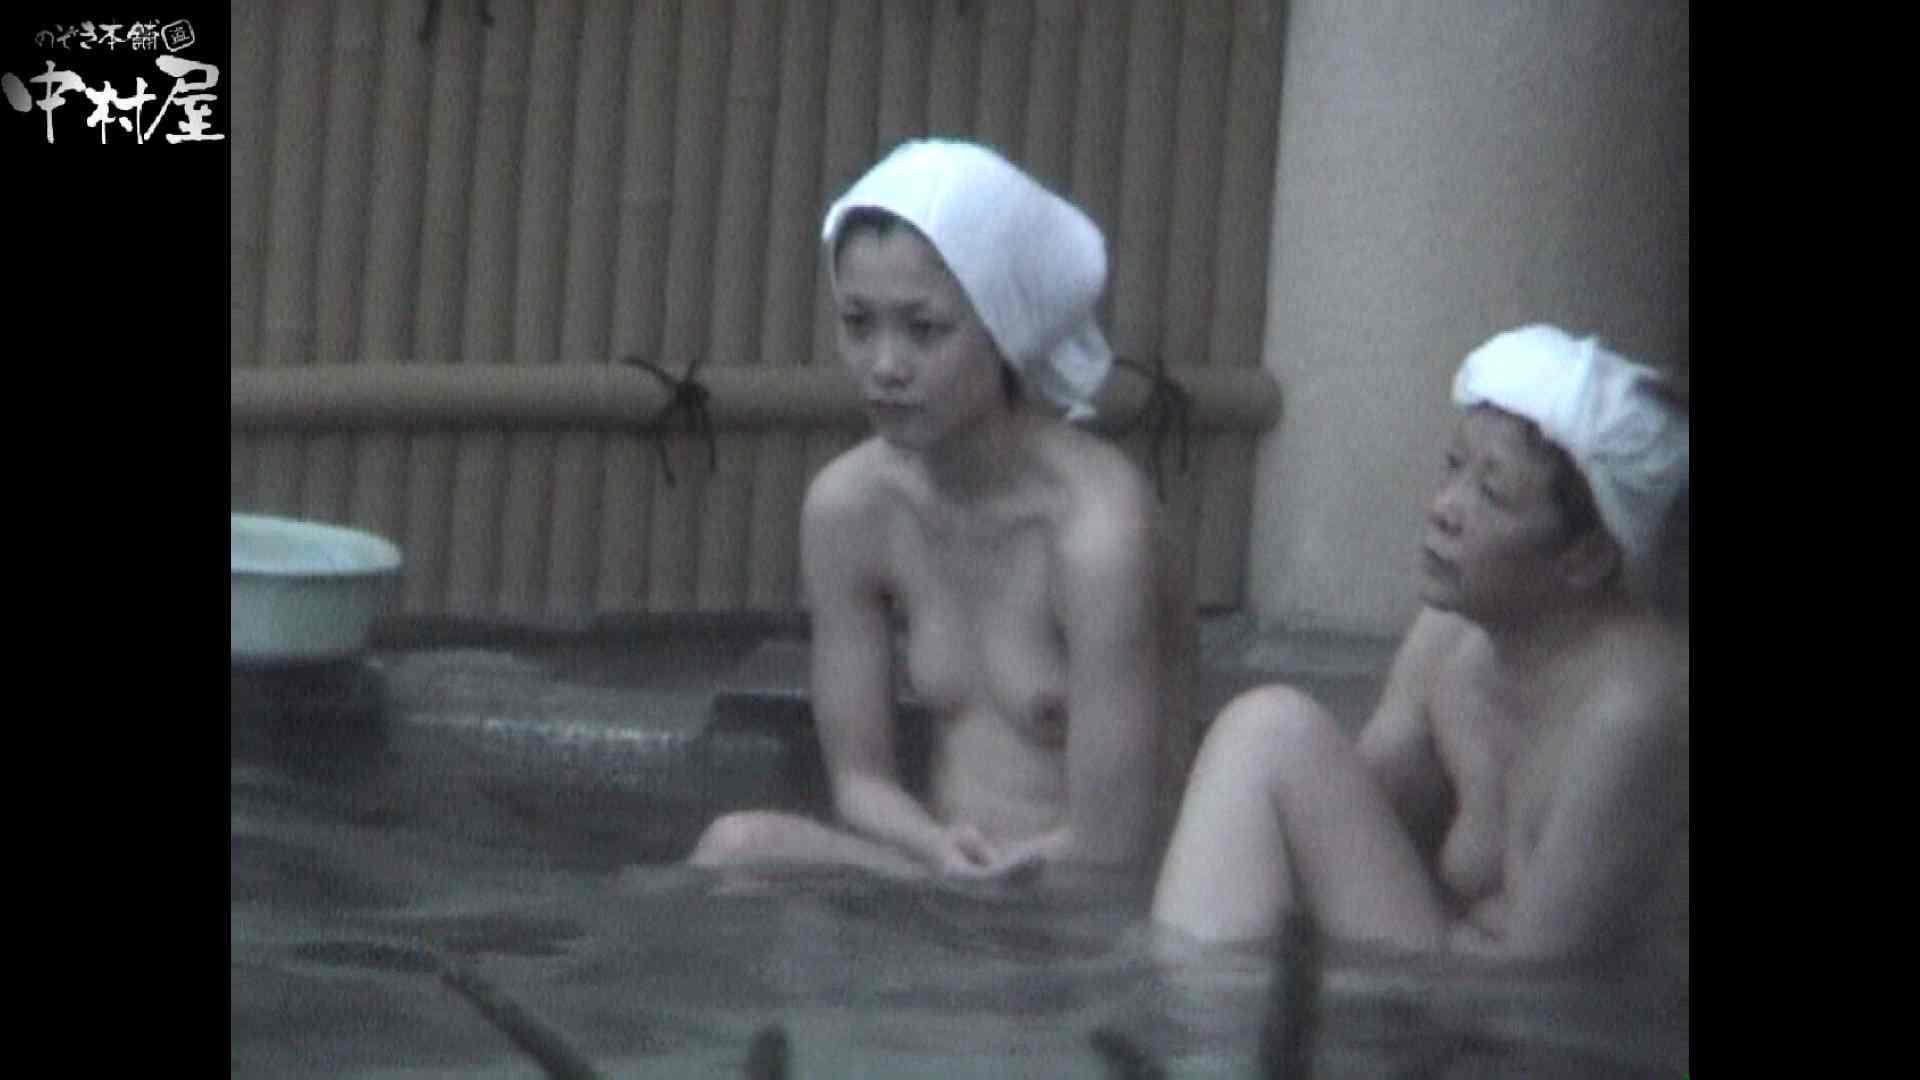 Aquaな露天風呂Vol.924 OLのエロ生活 オメコ動画キャプチャ 62連発 35